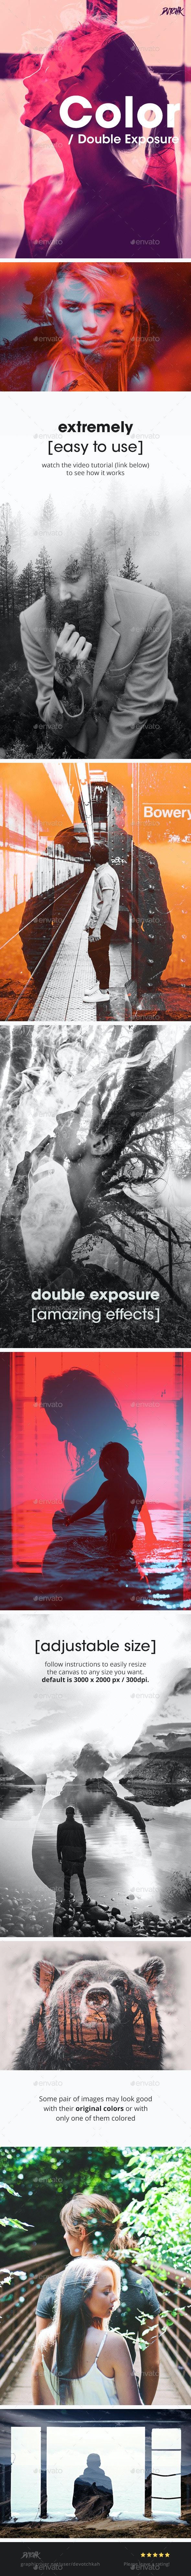 Color - Double Exposure Photoshop Photo Template - Photo Templates Graphics